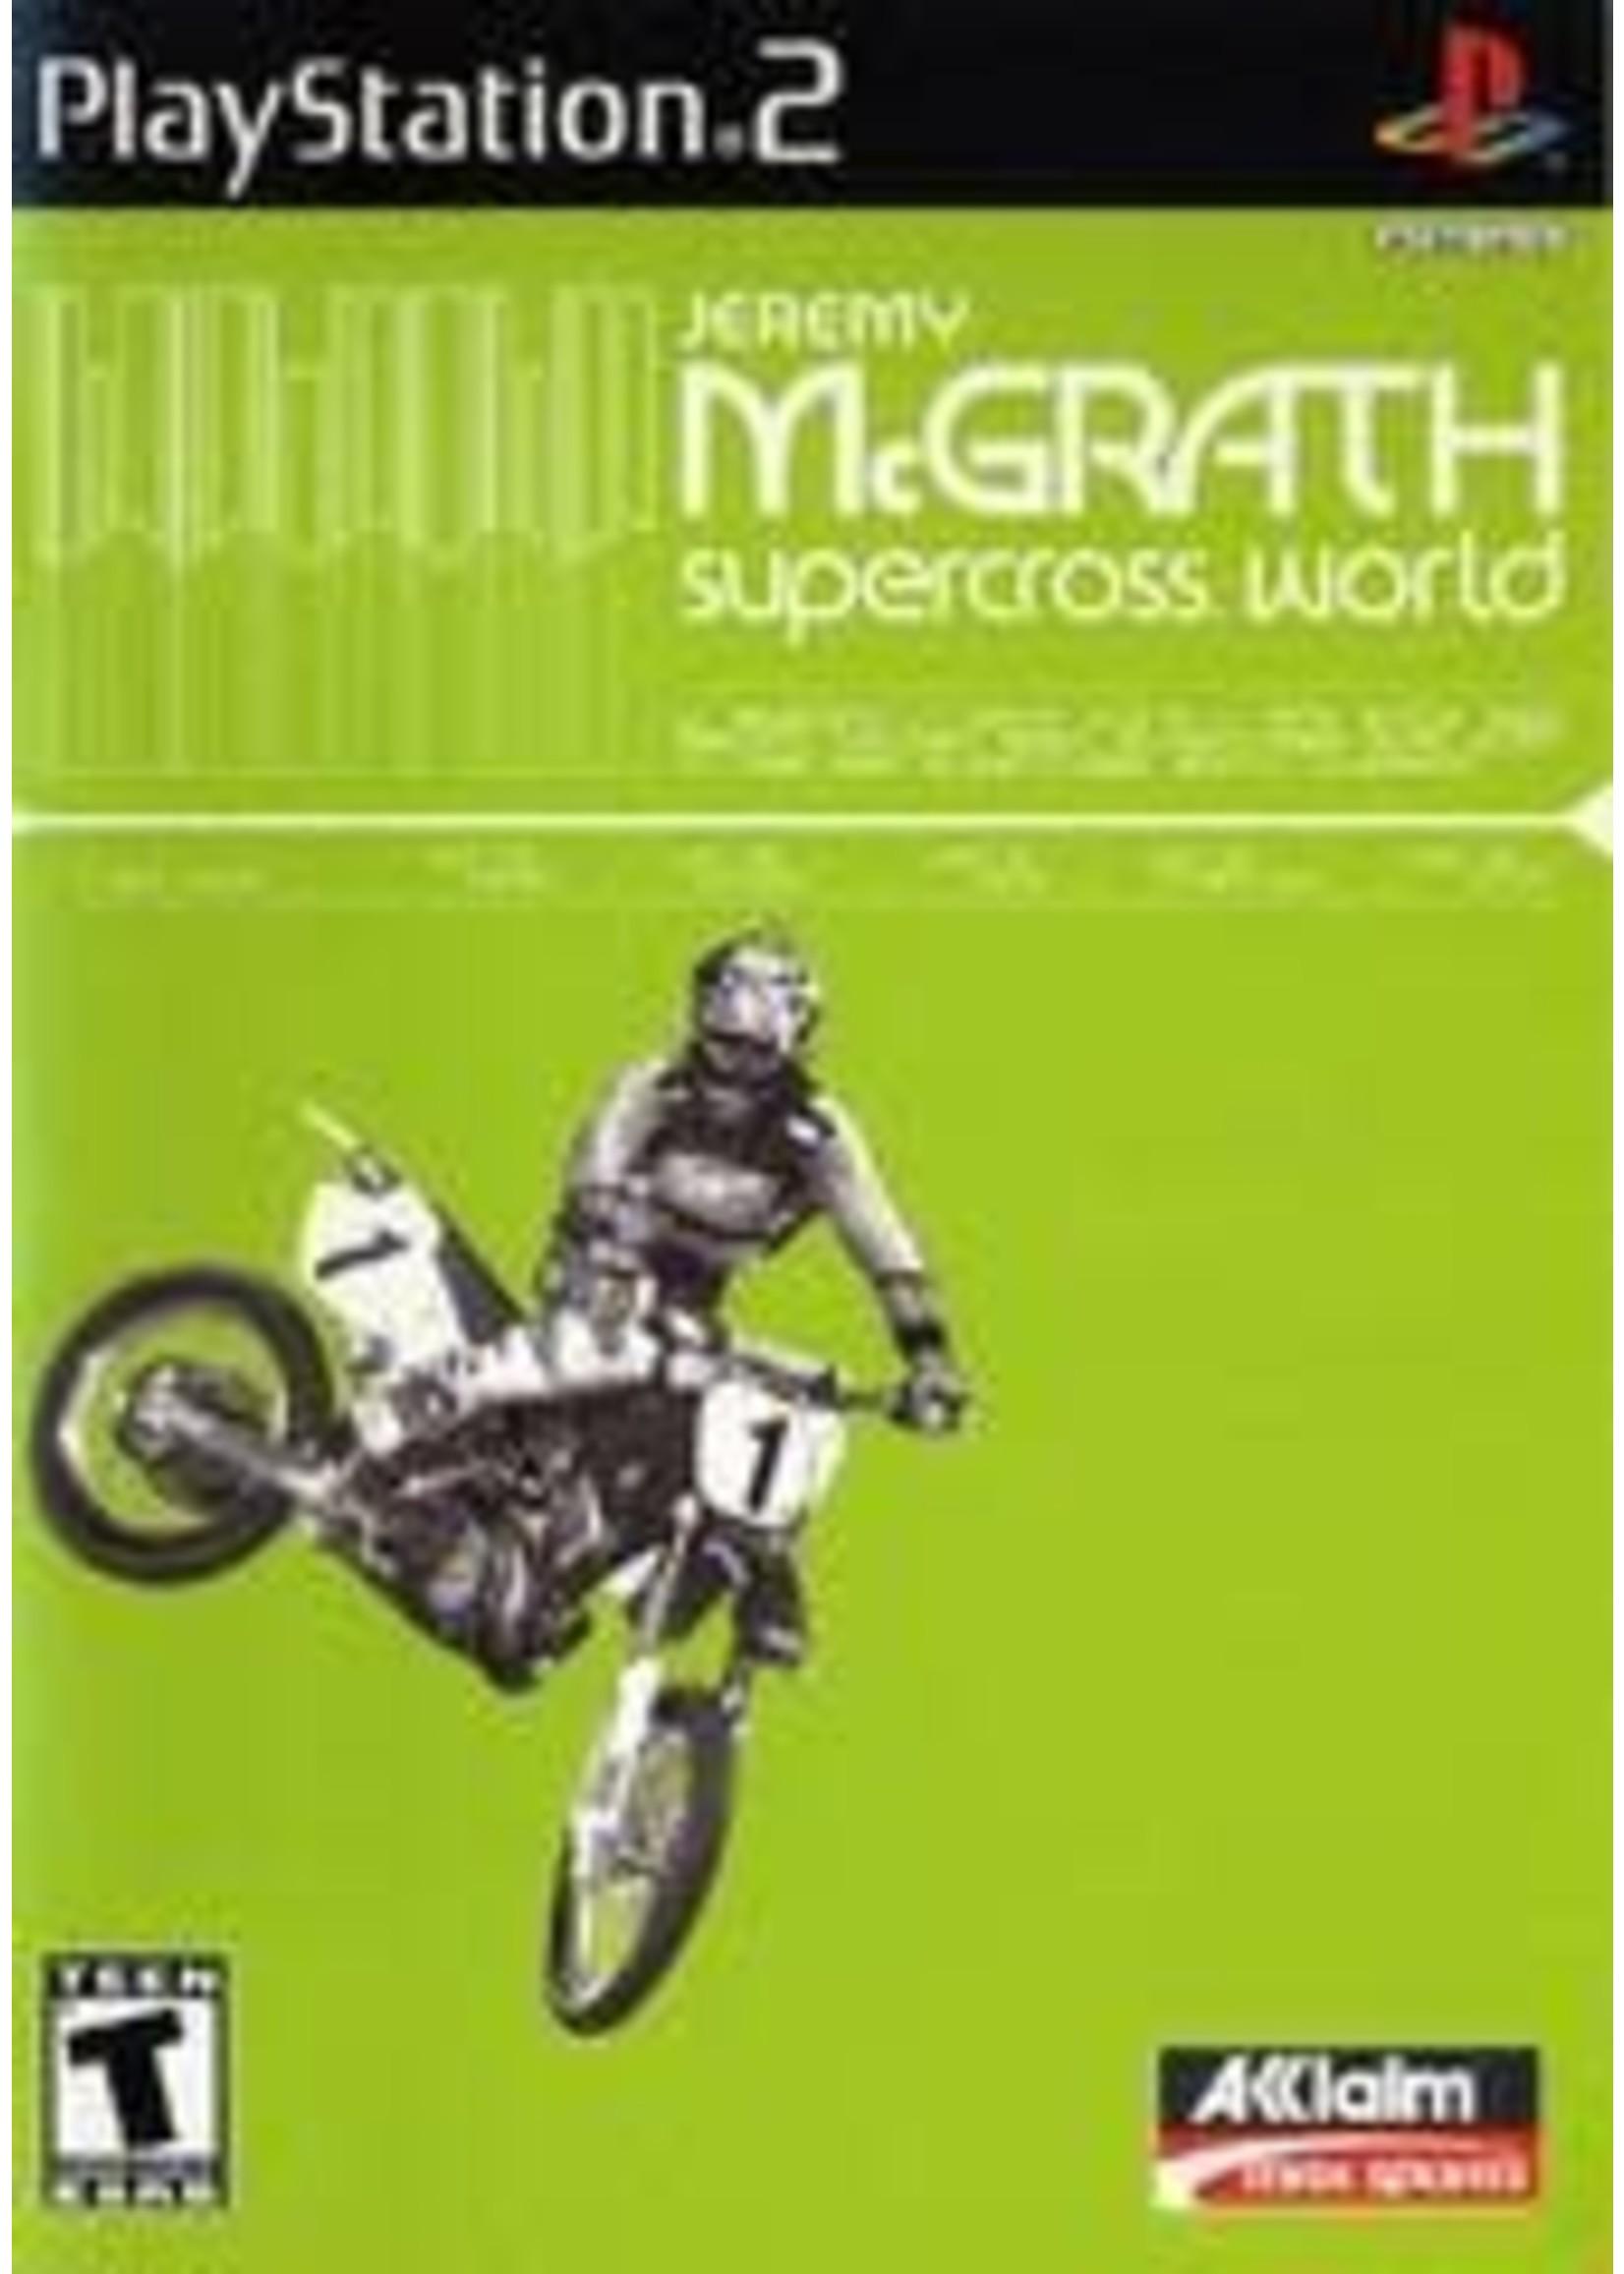 Jeremy McGrath Supercross World Playstation 2